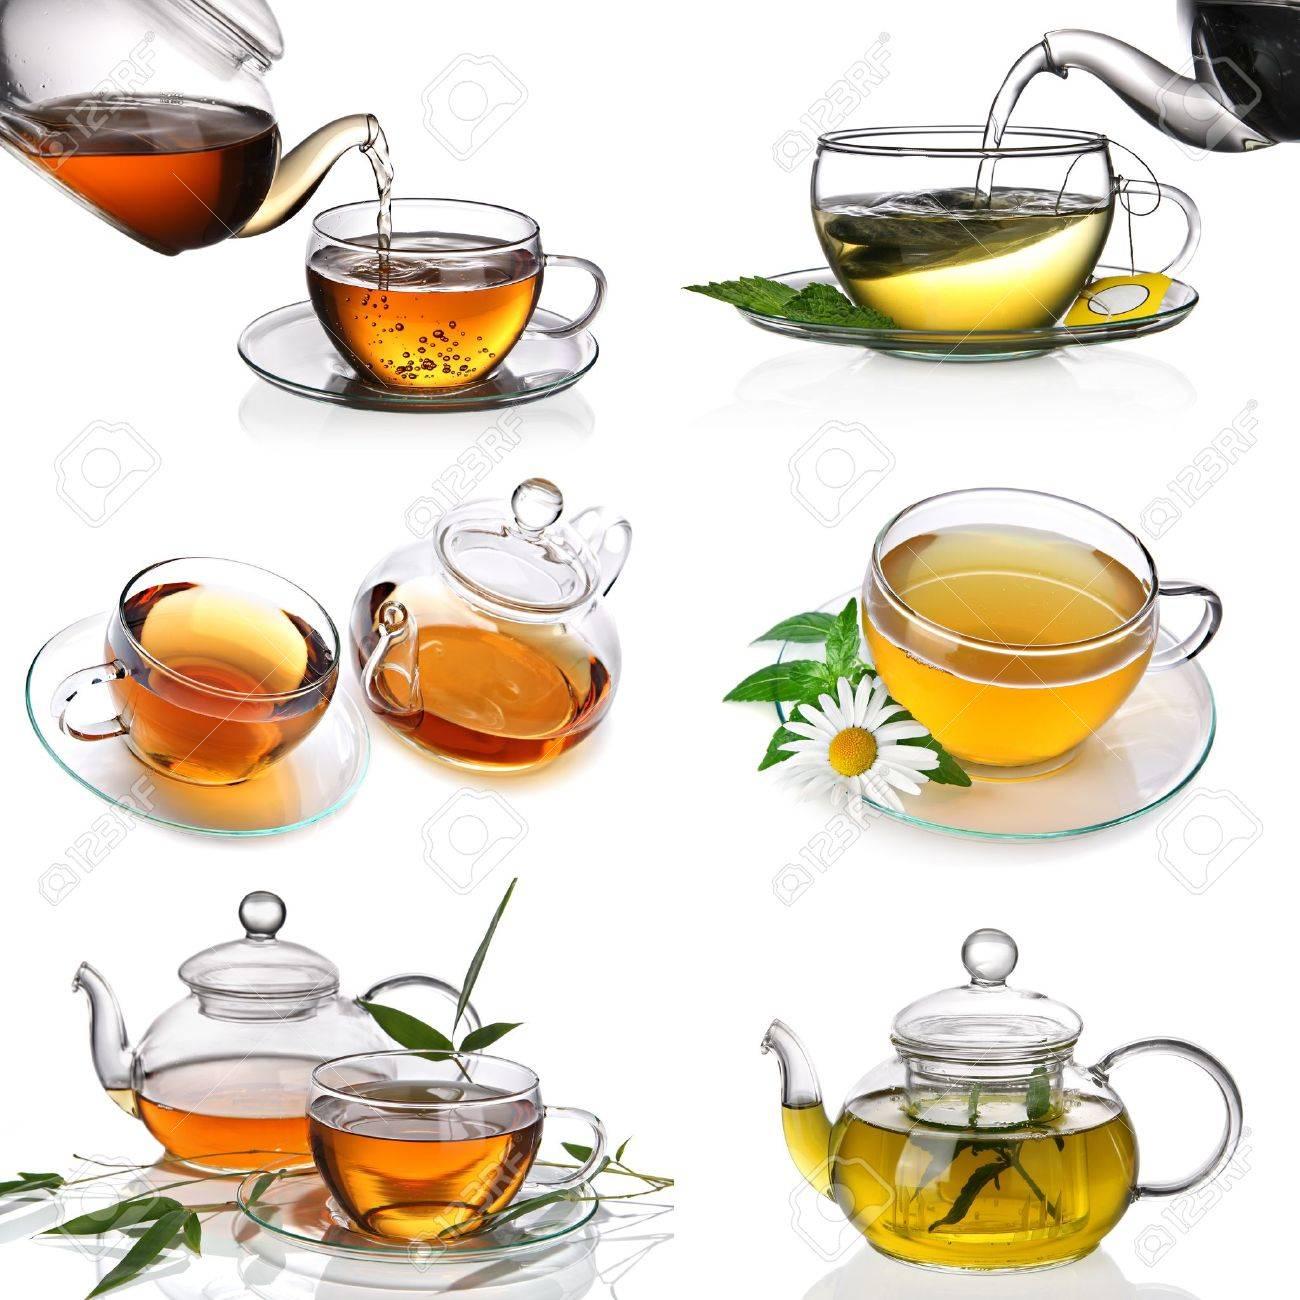 Tea collage Stock Photo - 9546930